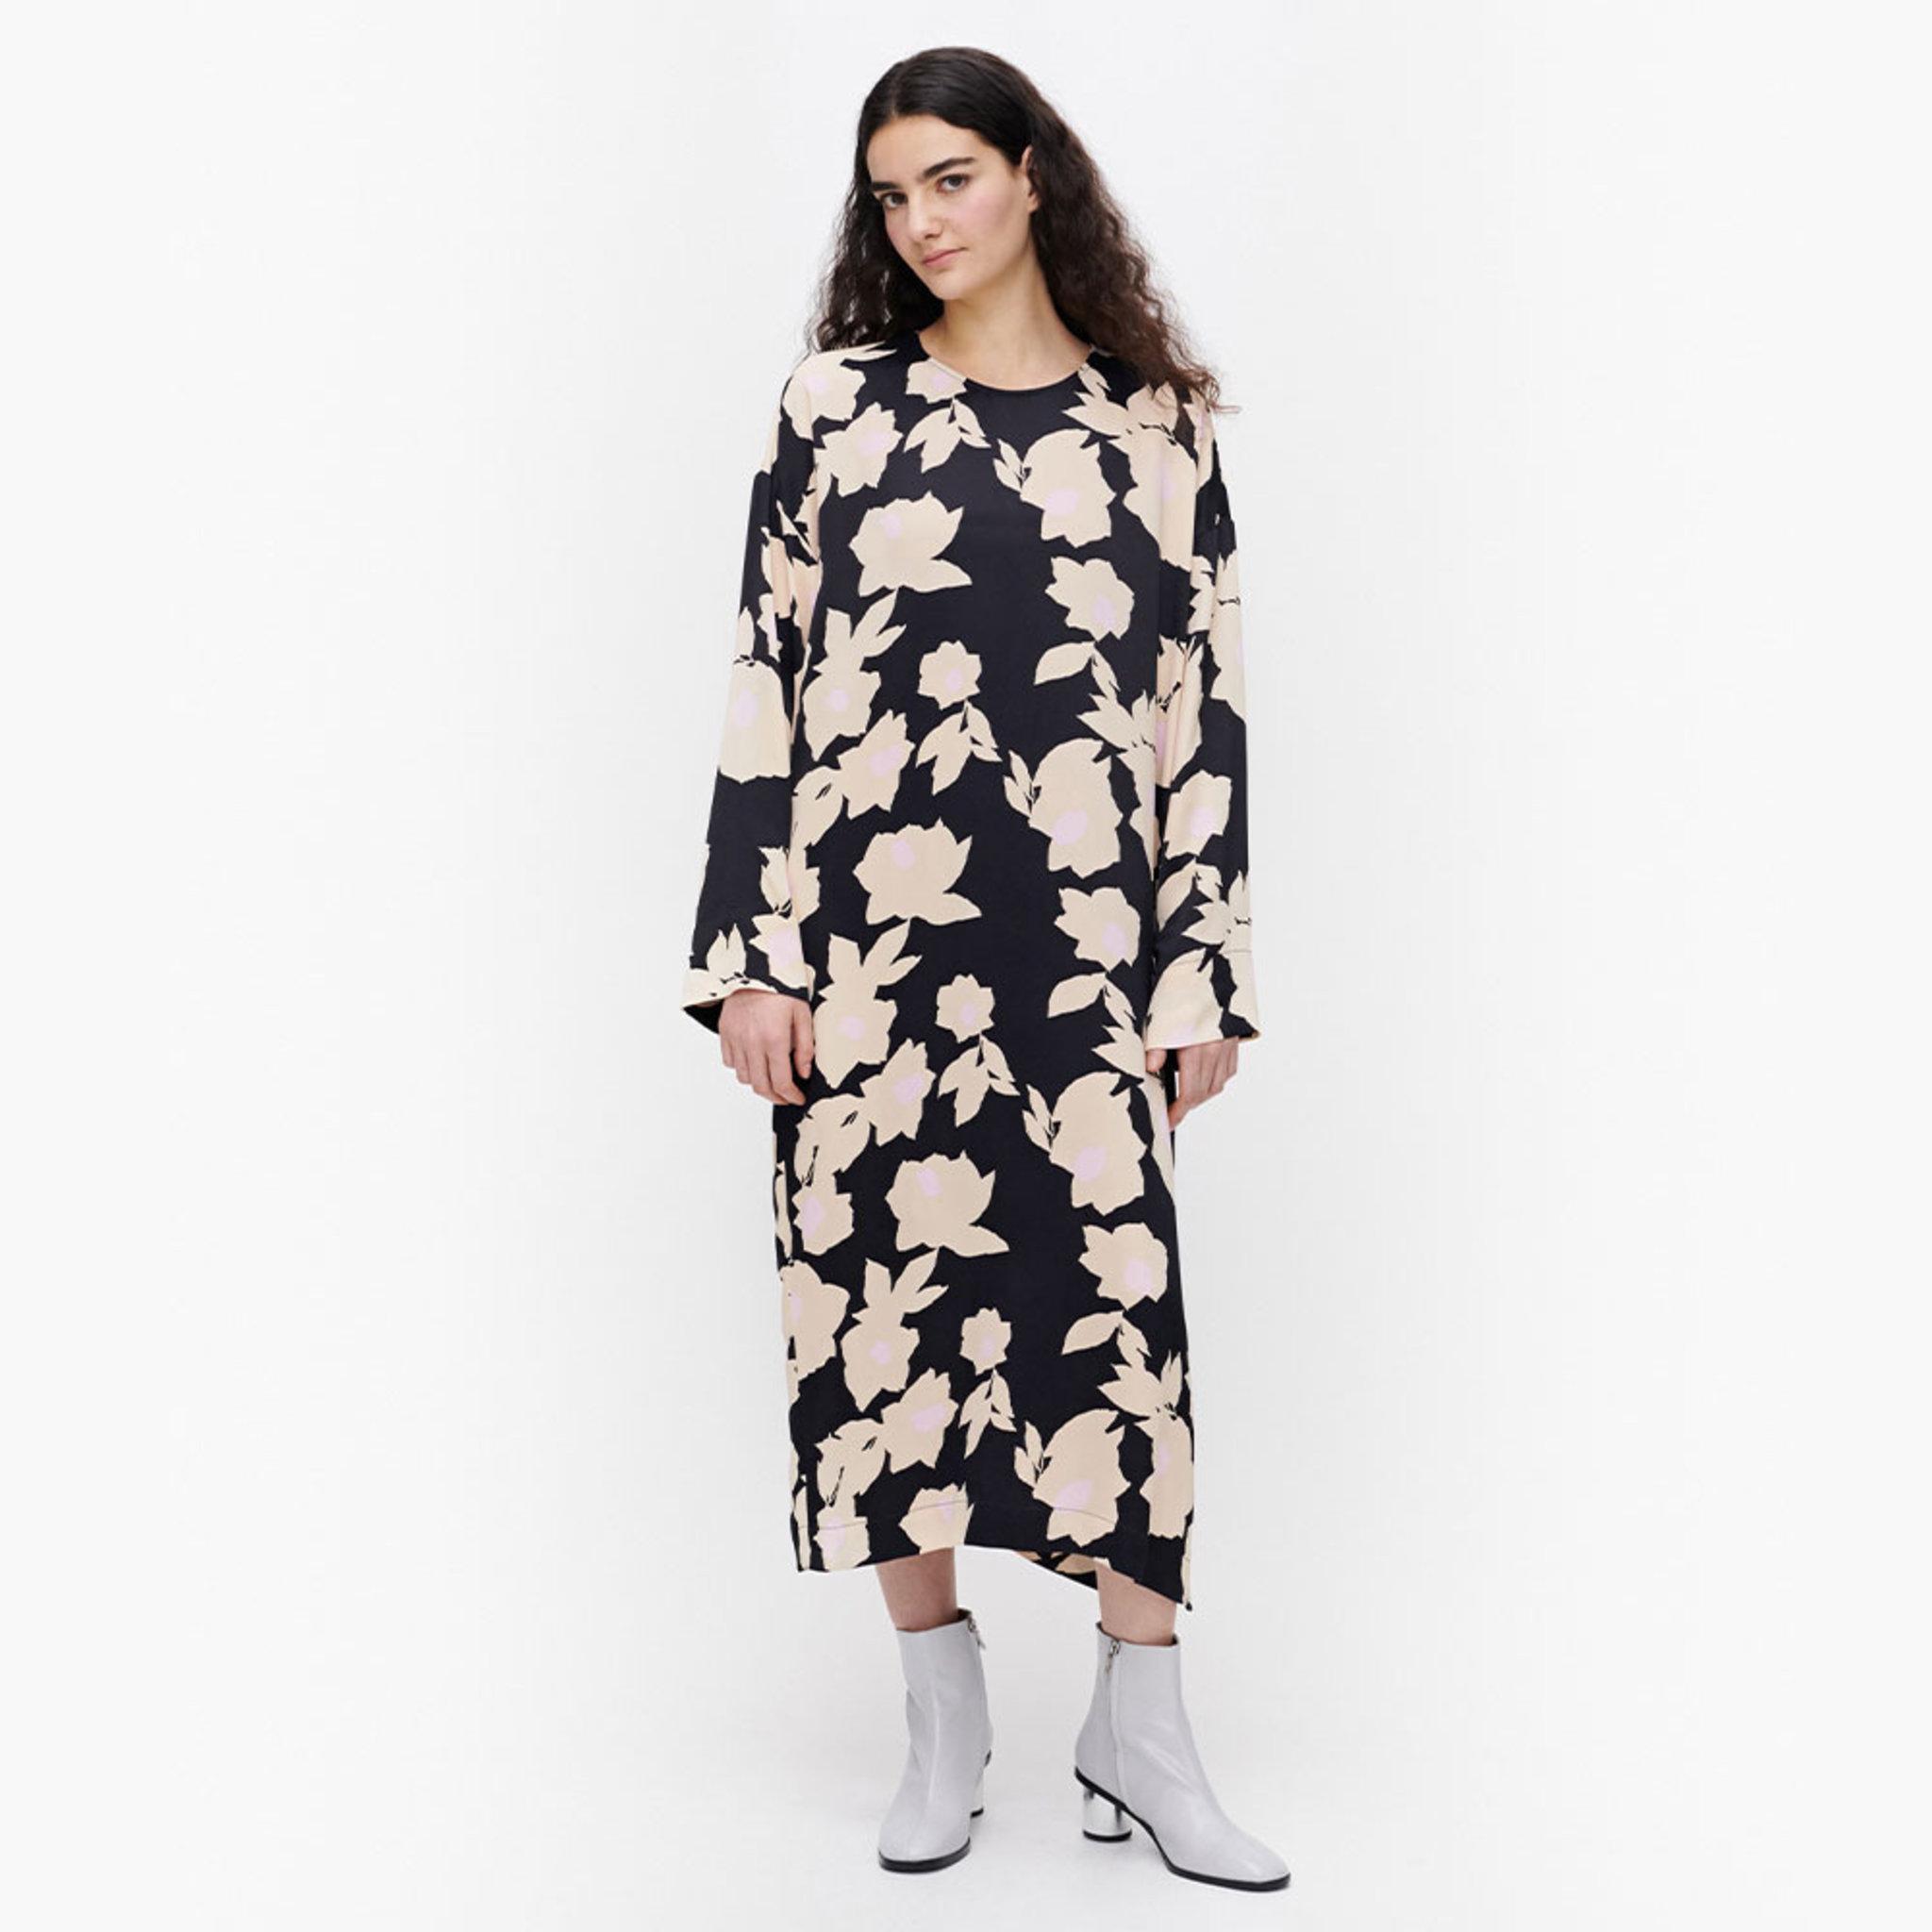 Maininta Jäärouva Dress